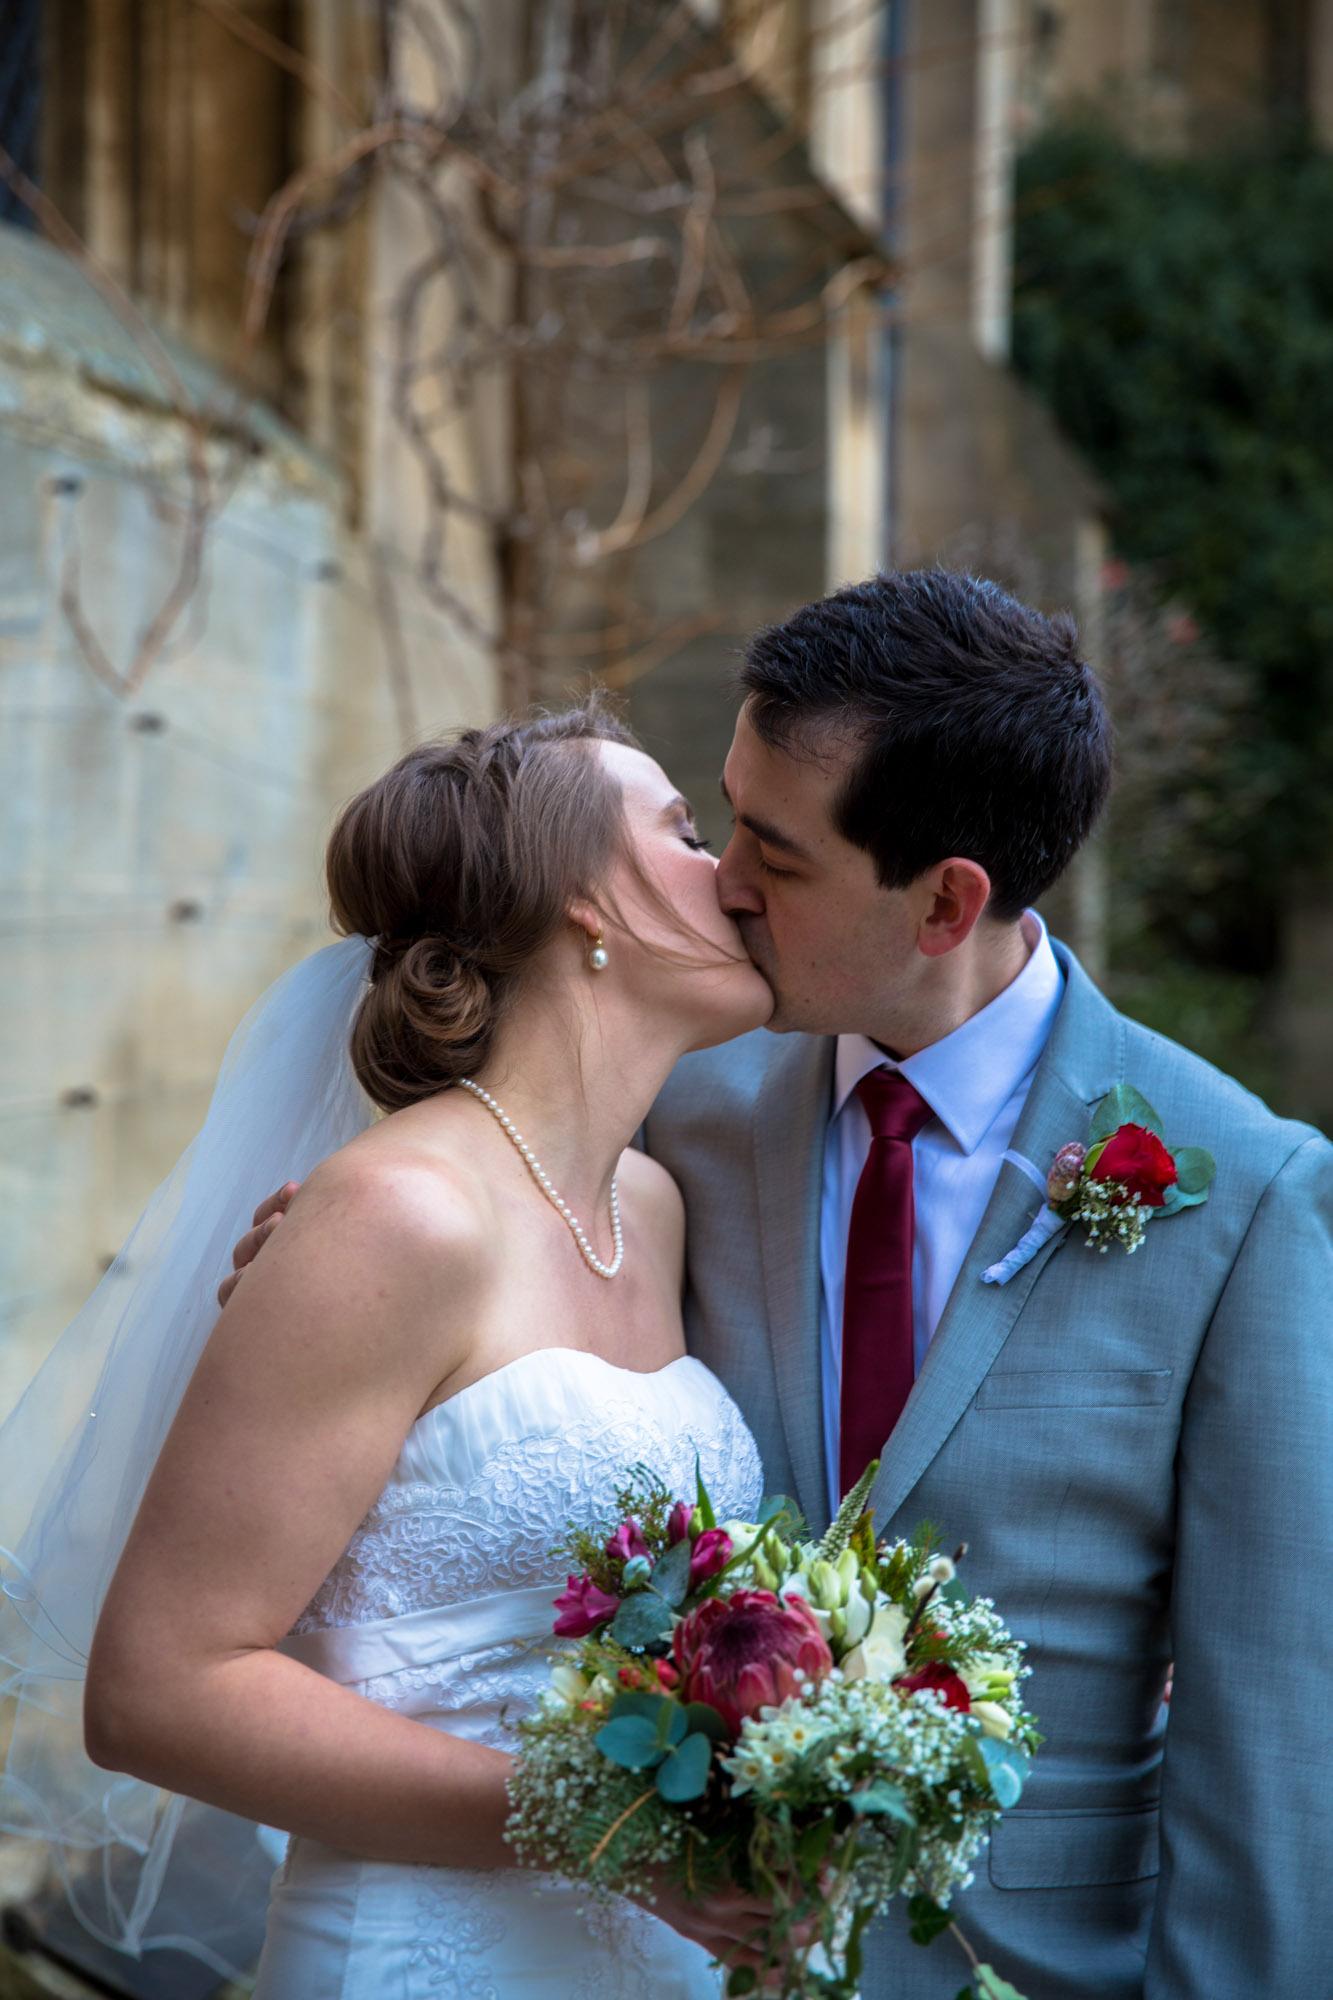 weddings-couples-love-photographer-oxford-london-jonathan-self-photography-88.jpg